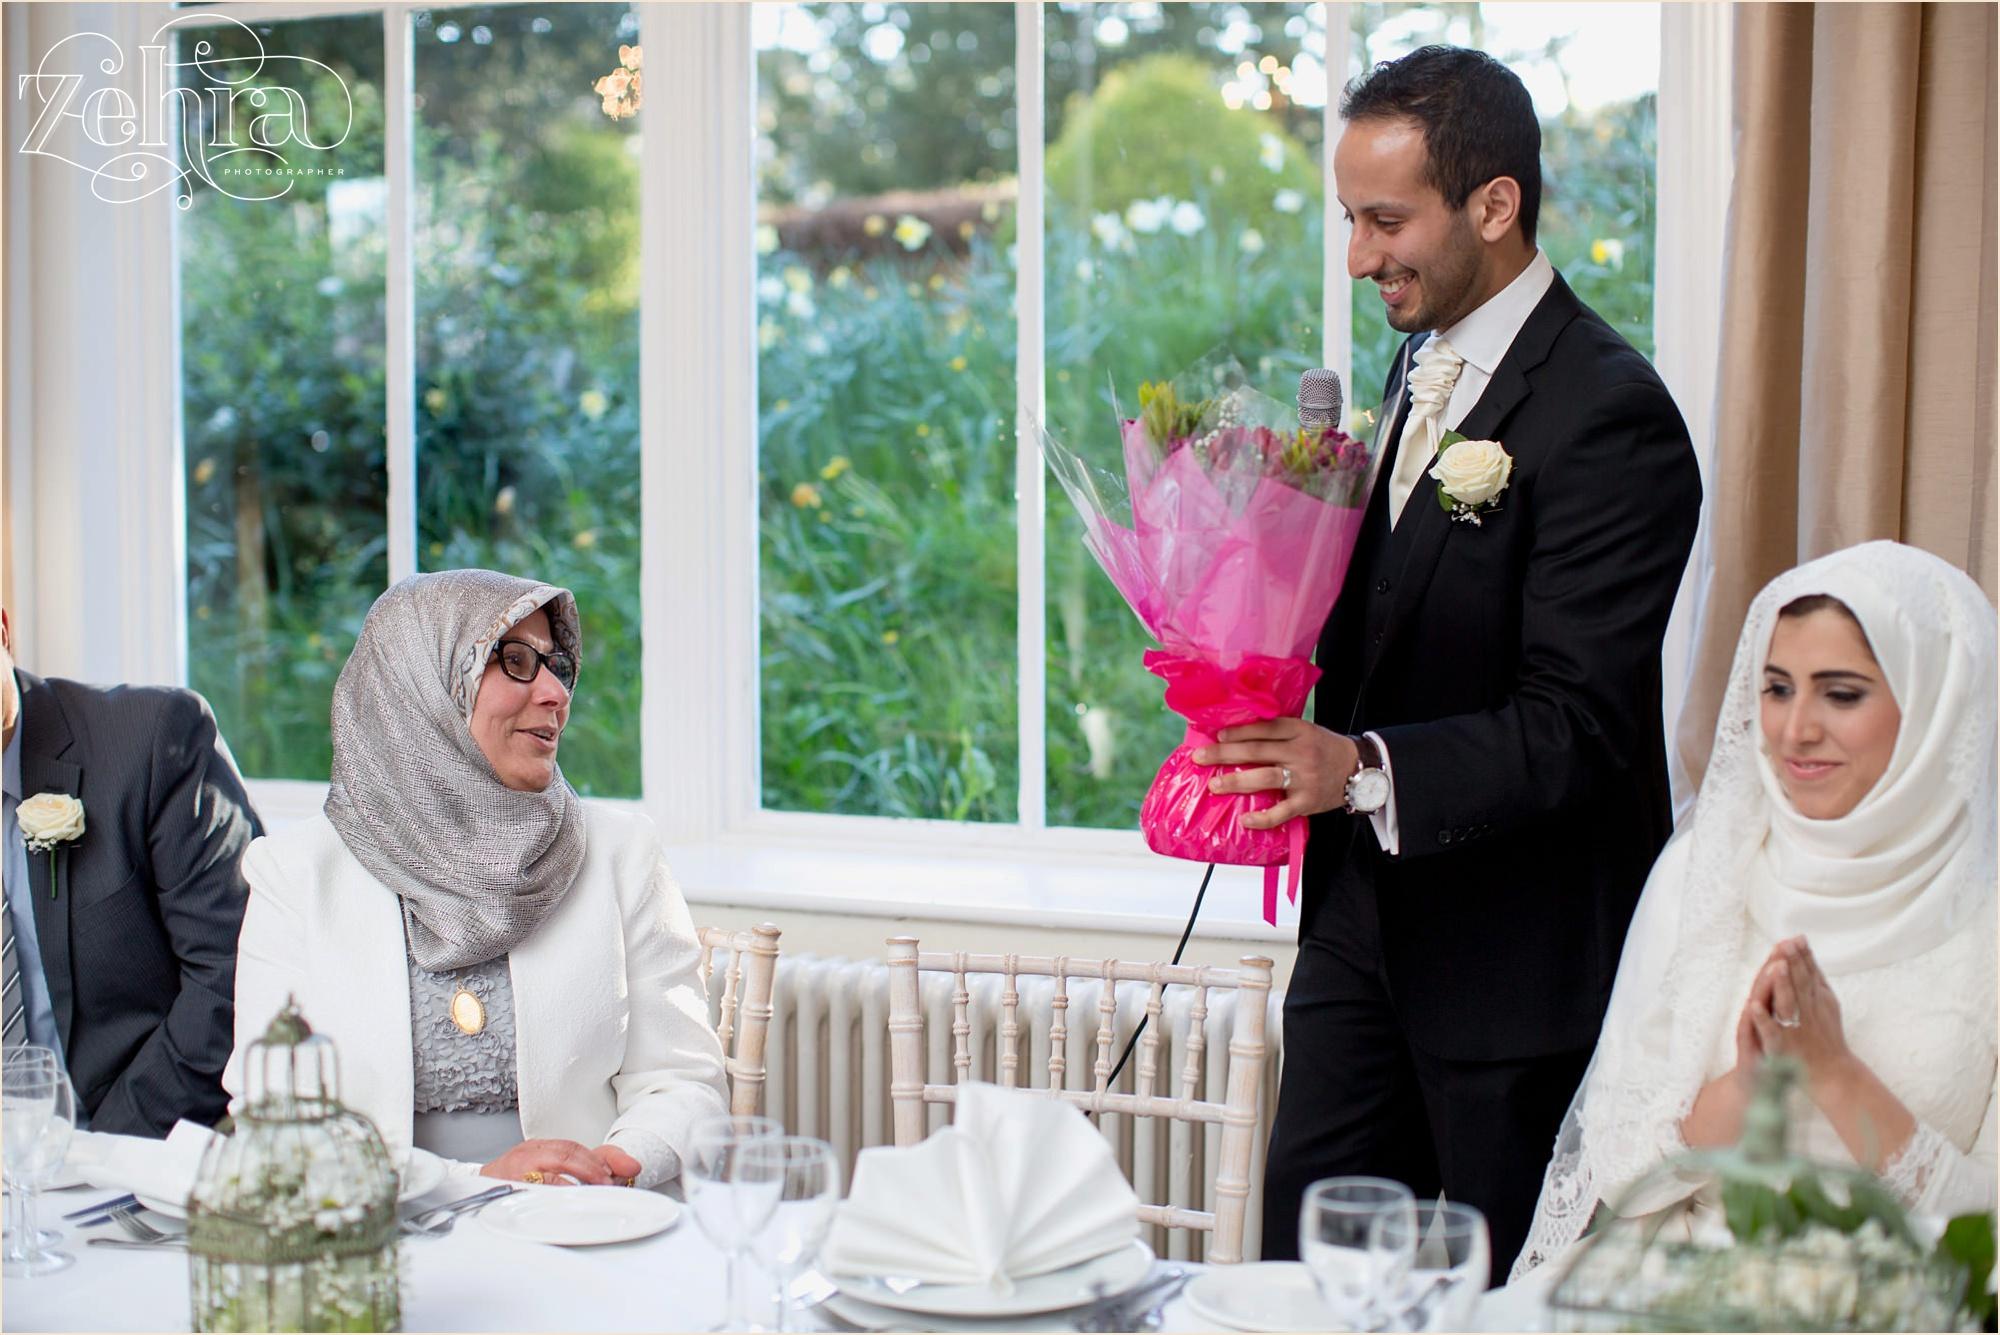 jasira manchester wedding photographer_0116.jpg